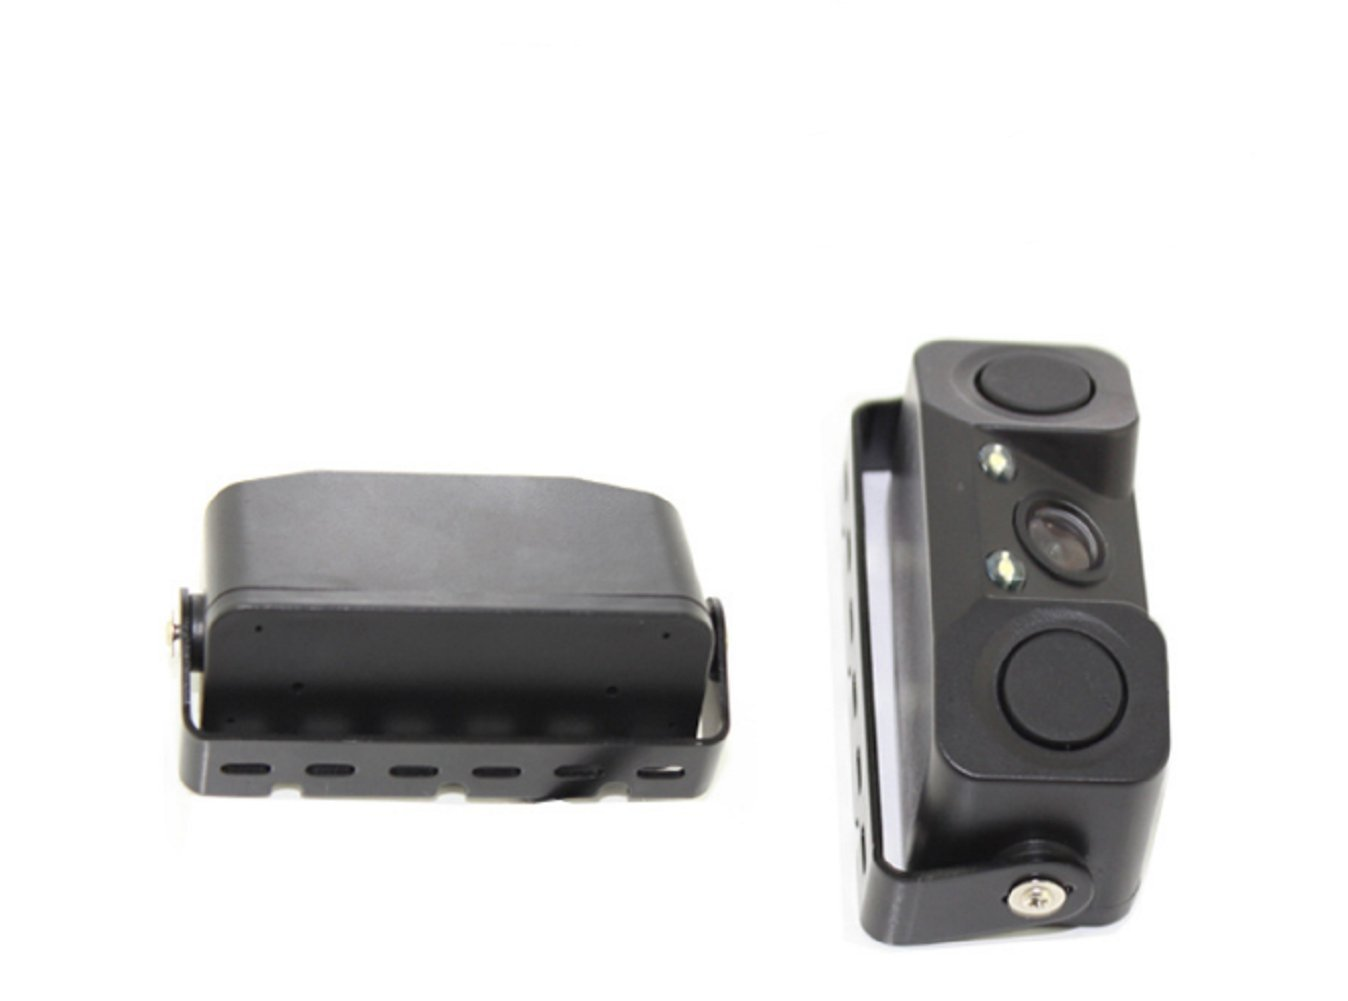 Kiptop Car Backup Camera Night Vision Waterproof With Reverse Light Wire Diagram 99 Chevy 2 Radar Parking Sensor Buzzer 170 Degree Wide Vie Hd Auto Rear View